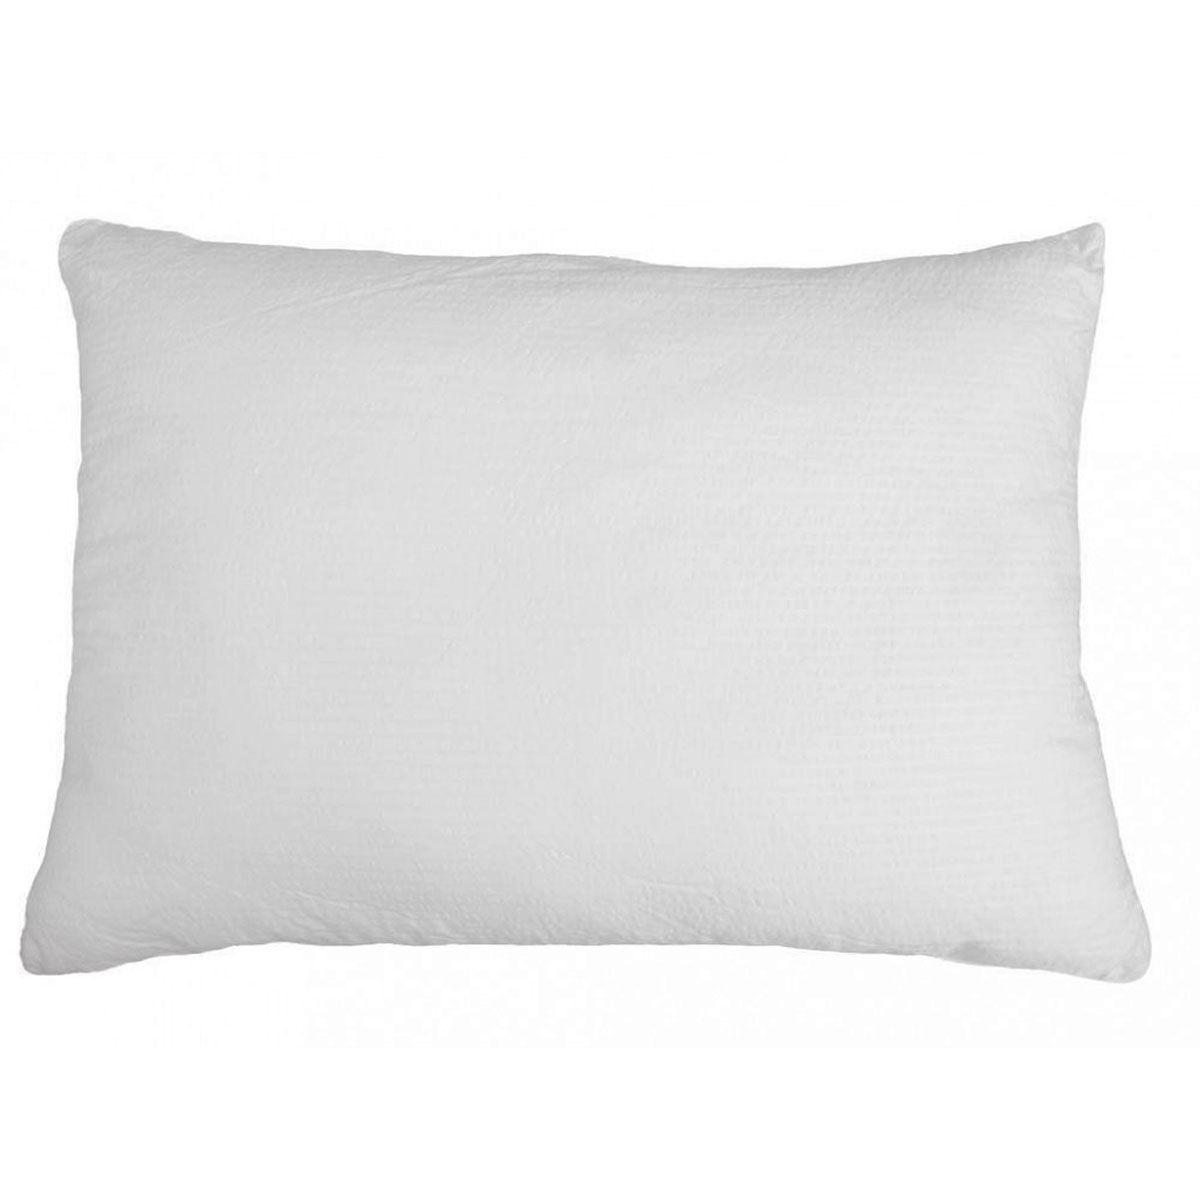 Toison d'Or Oreiller rectangle aspect gaufré polyester blanc 70x50